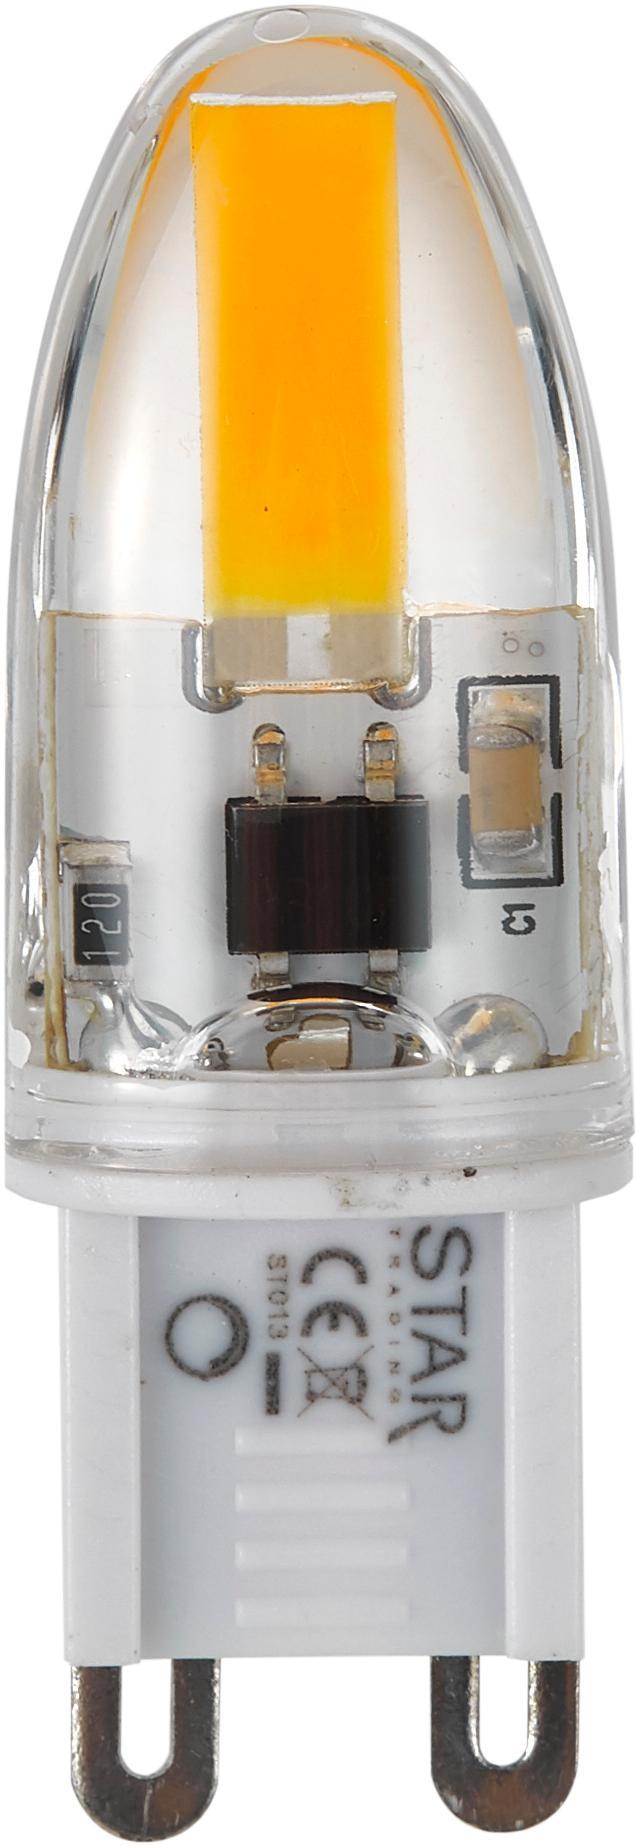 Lampadina a LED Halo (G9/1,6Watt) 5pz, Vetro, Trasparente, Larg. 2 x Alt. 5 cm